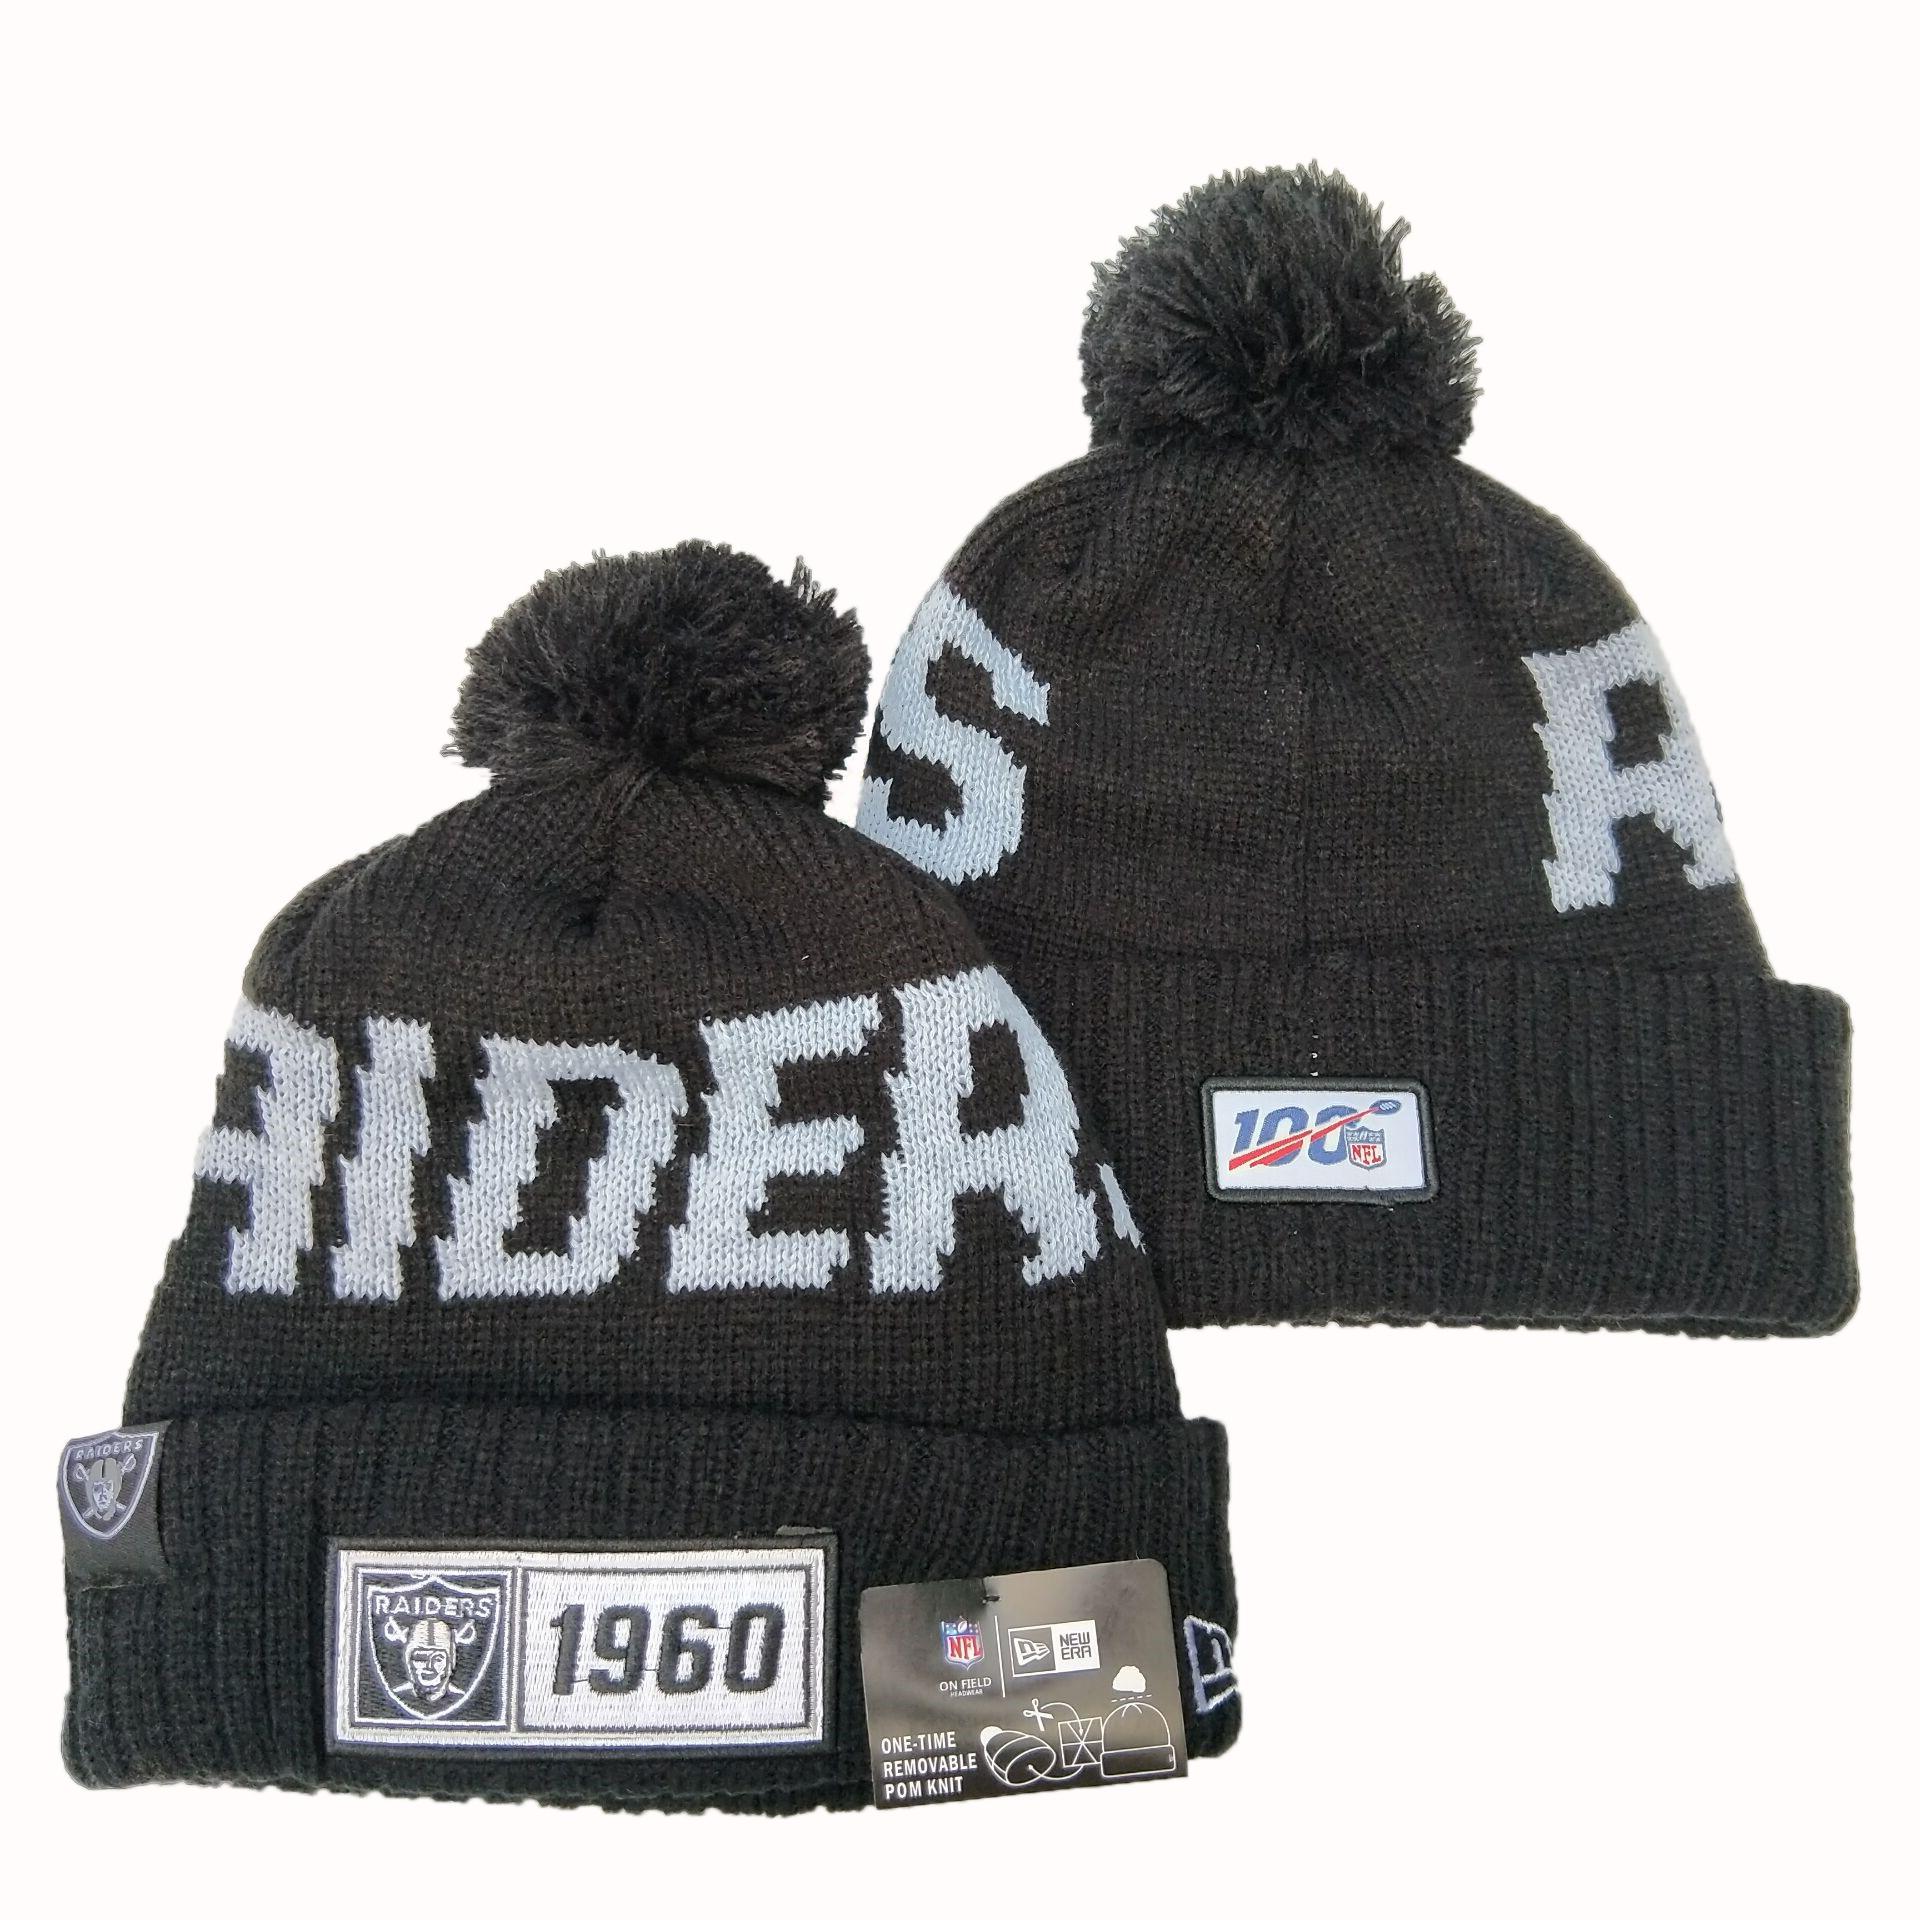 Raiders Team Logo Black 100th Season Pom Knit Hat YD